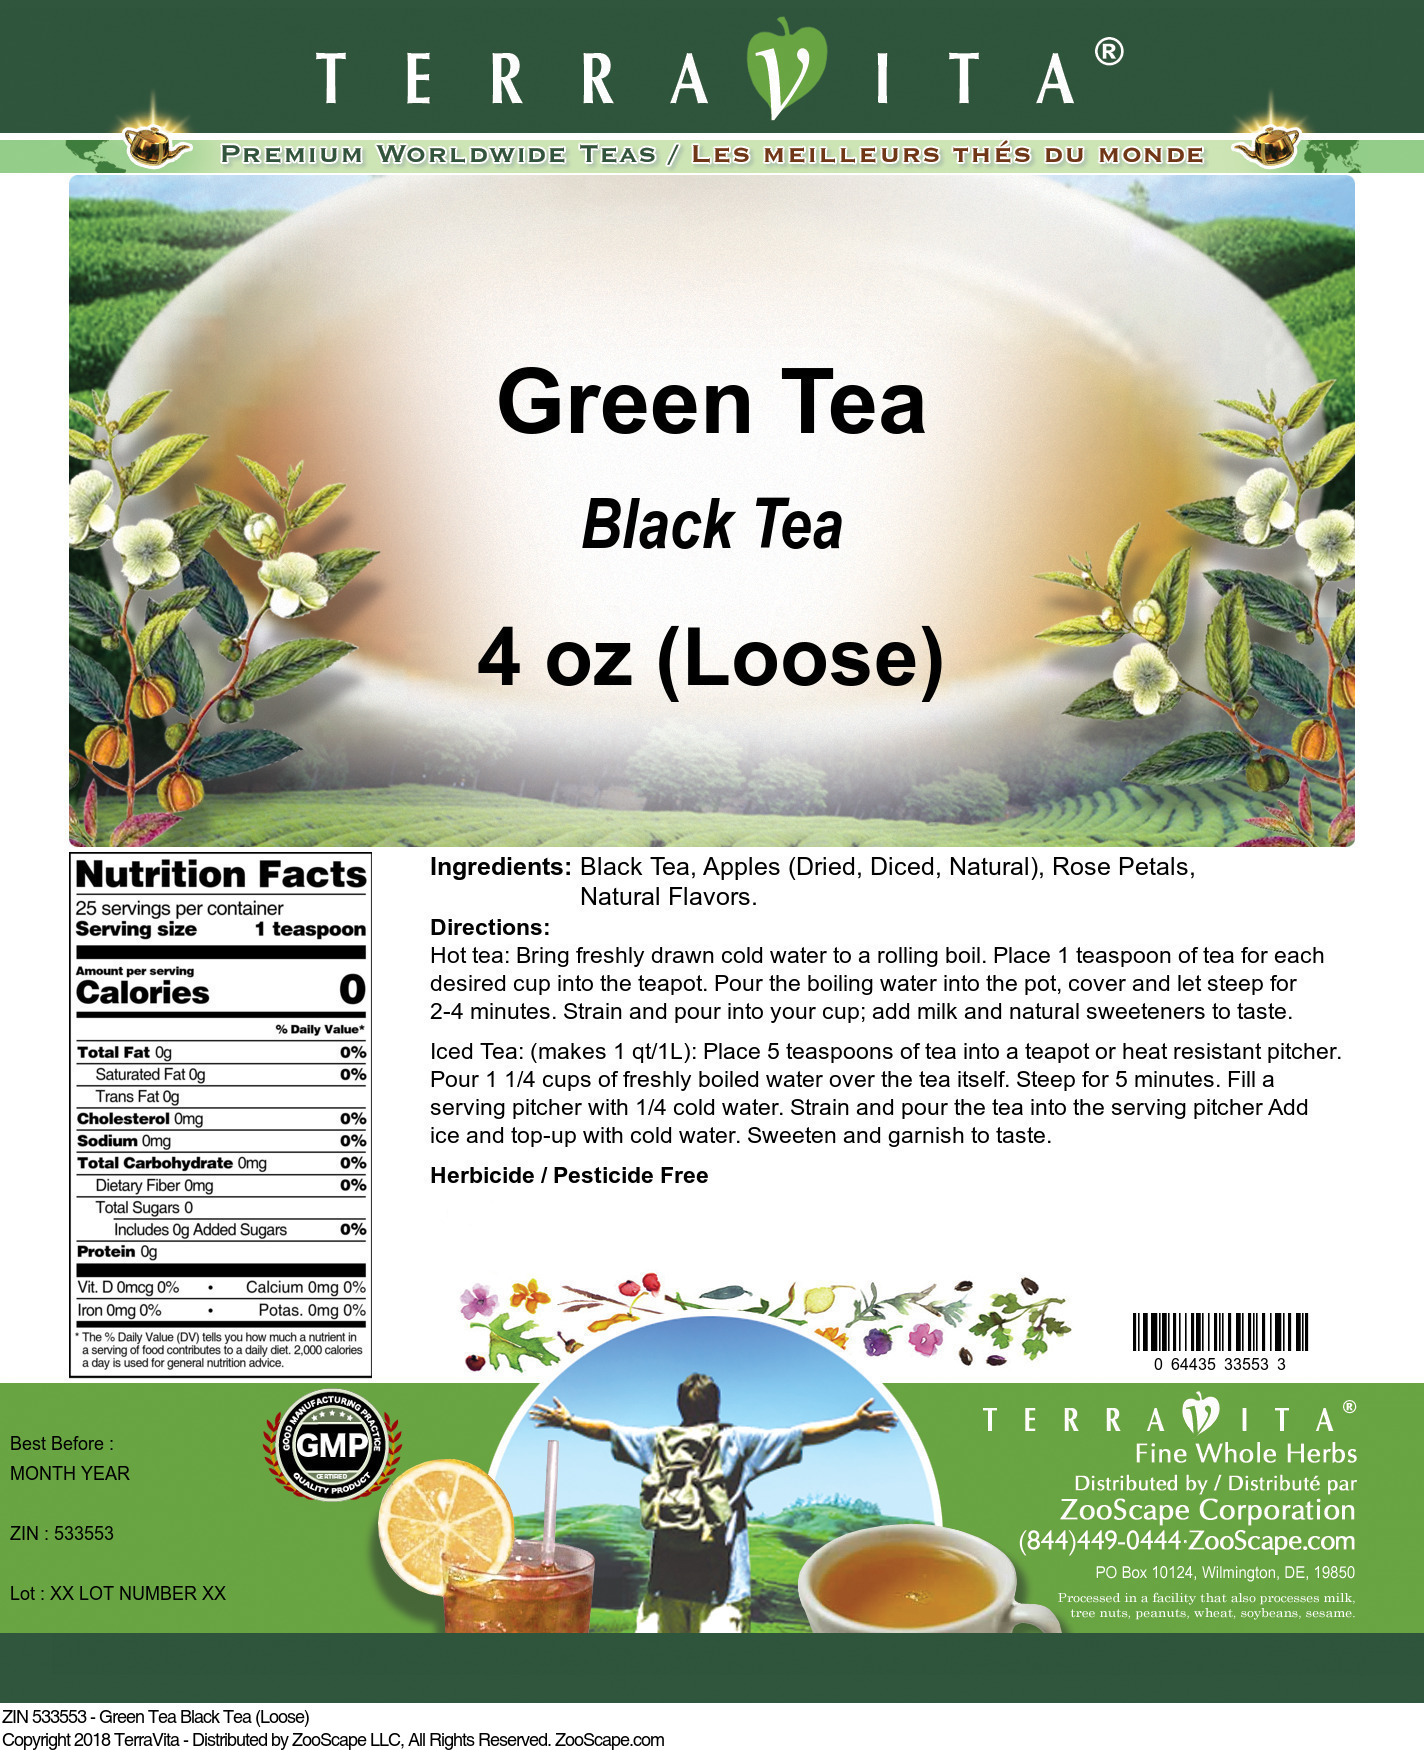 Green Tea Black Tea (Loose)